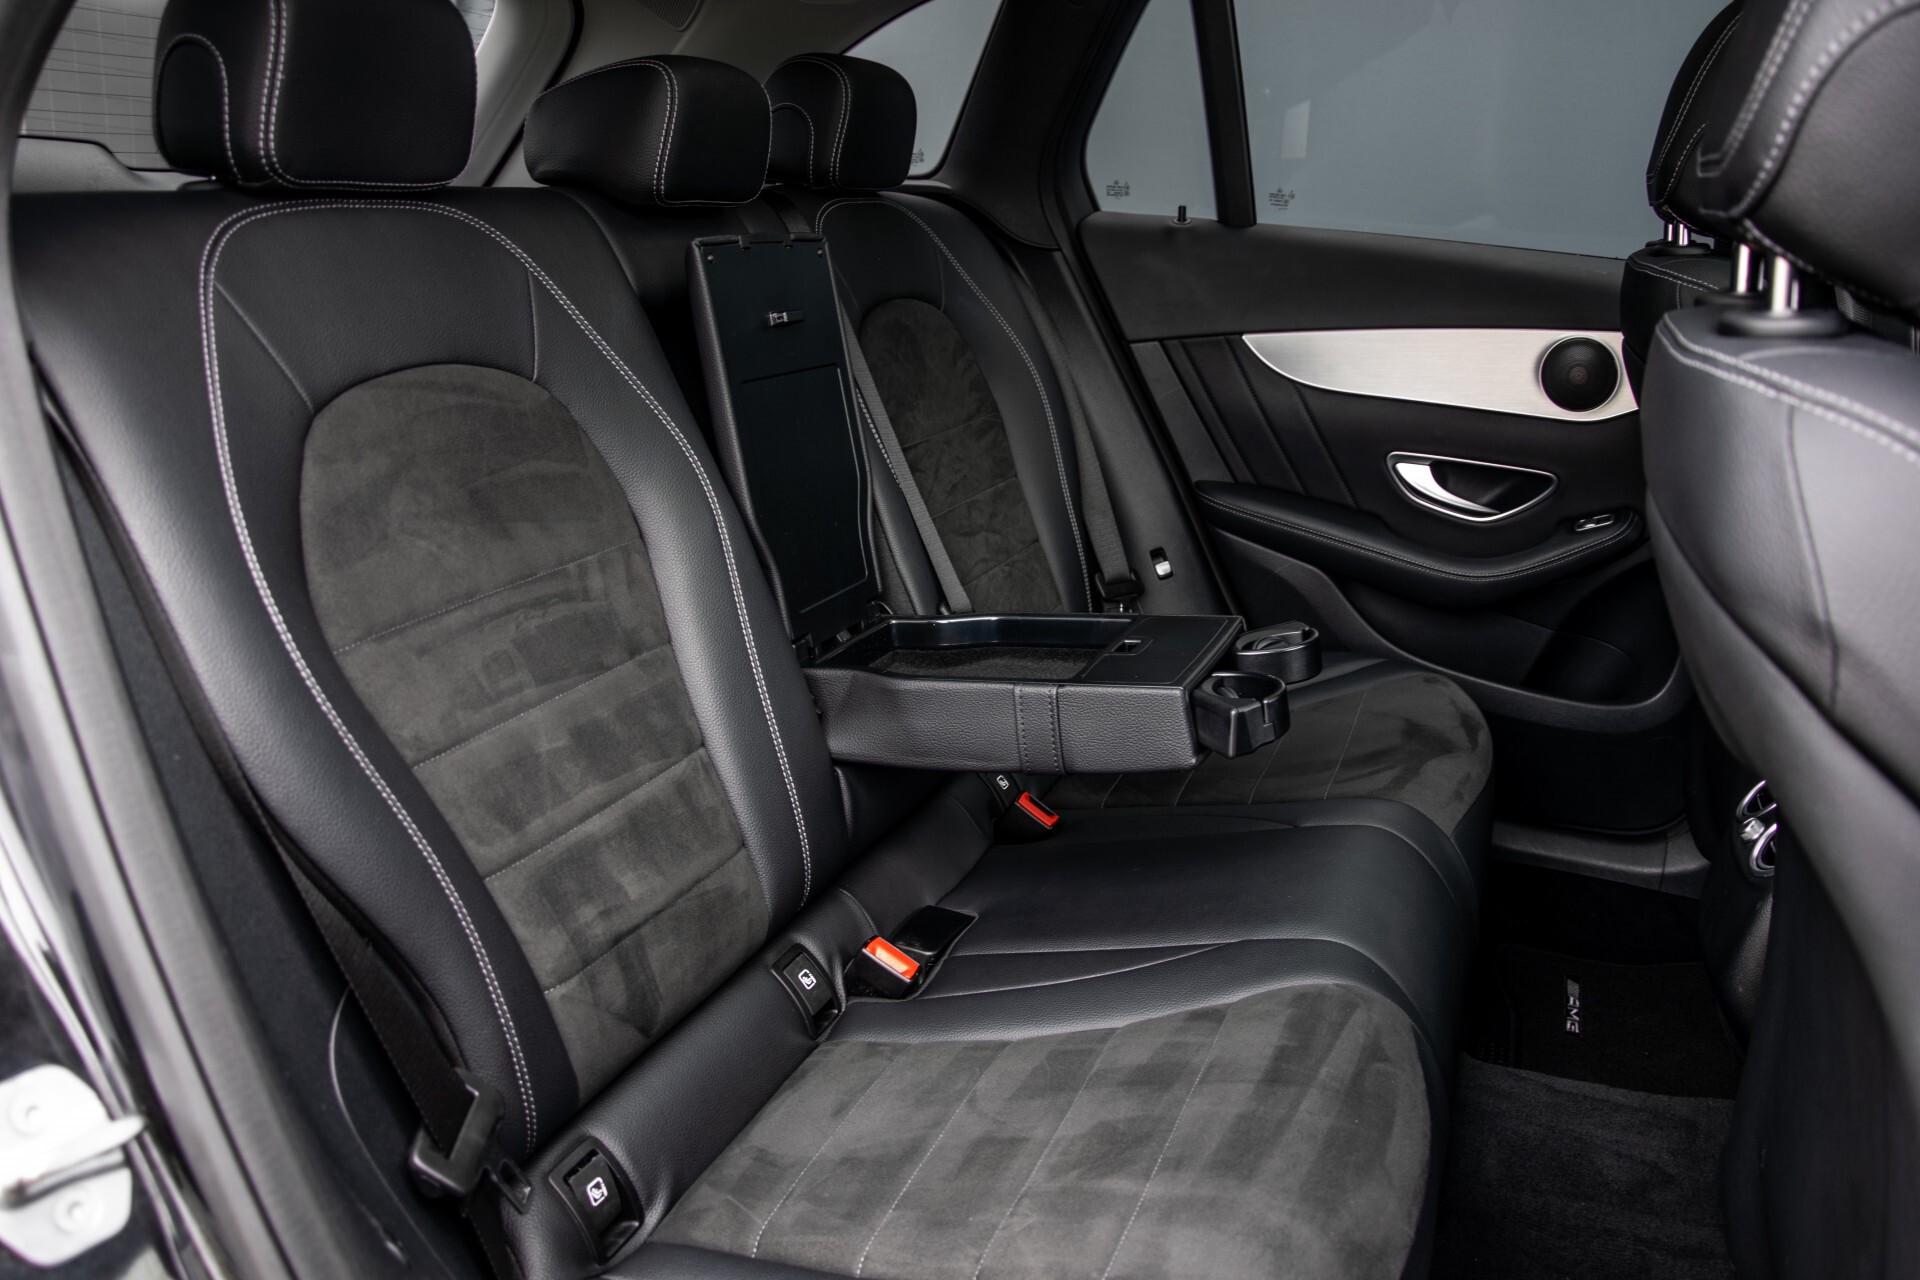 Mercedes-Benz GLC 220 d 4-M AMG/Distronic/Panorama/Comand/HUD/Afn-Trhk Aut9 Foto 5